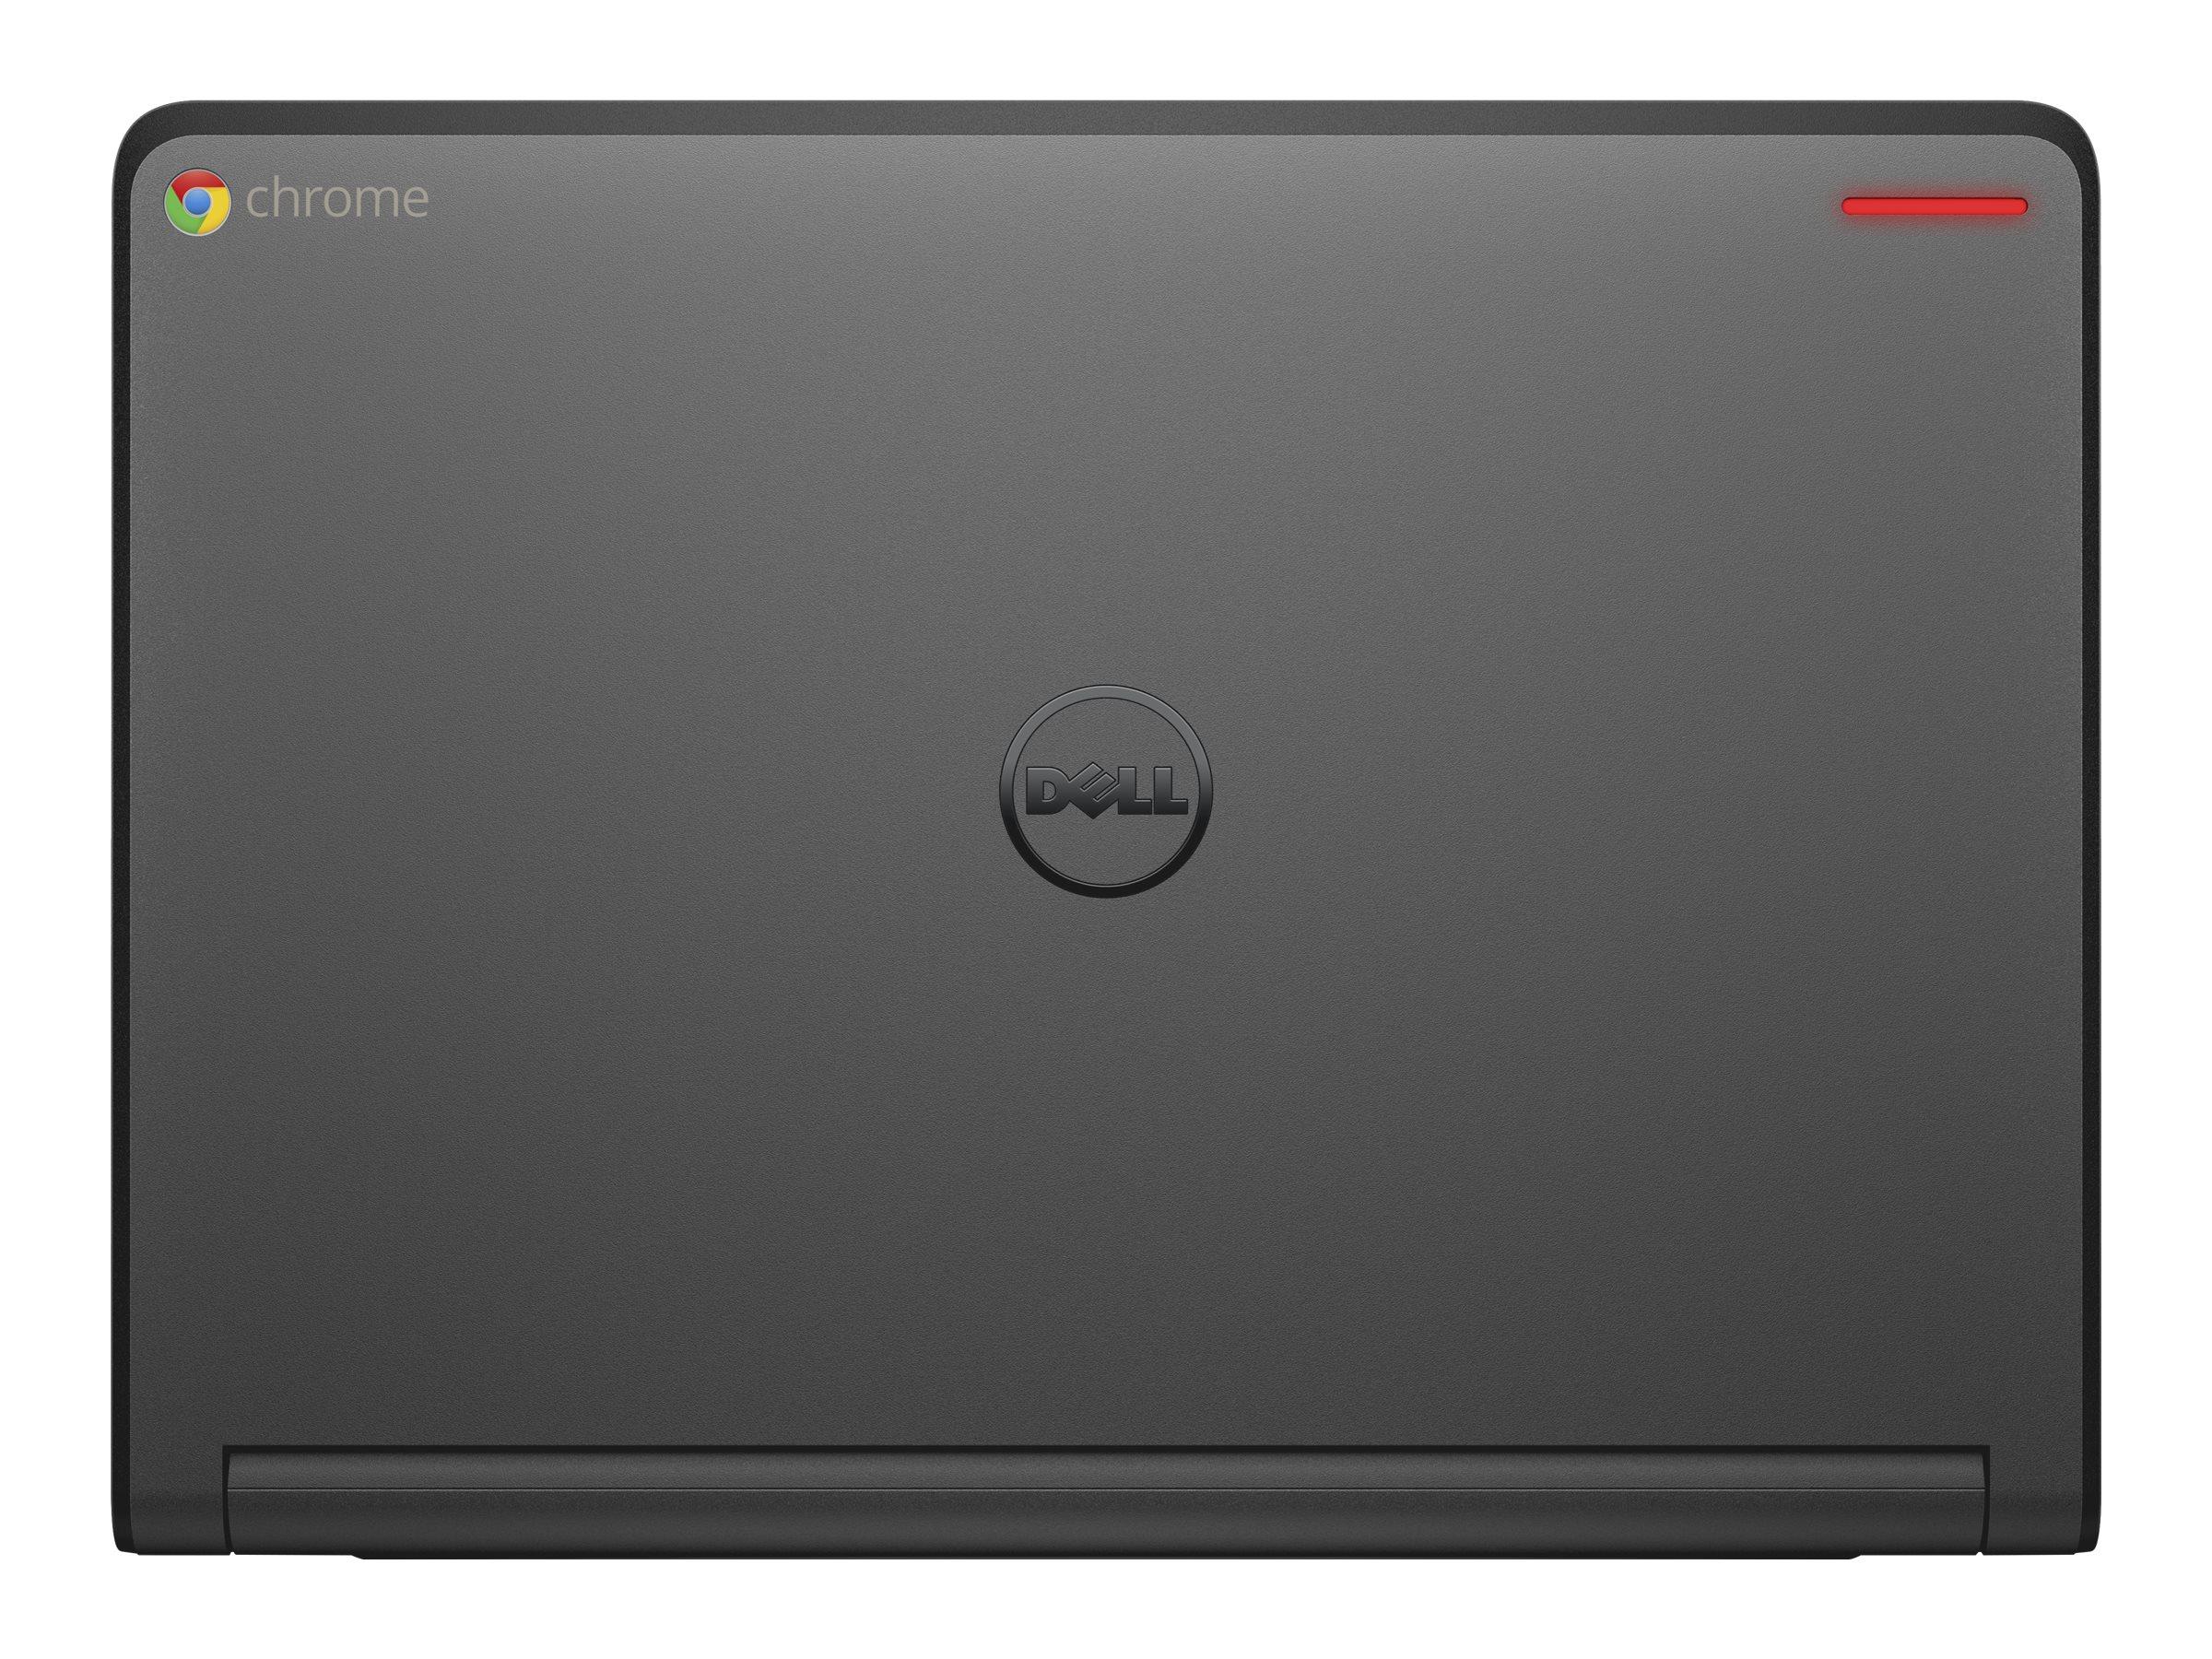 Dell 4MDFK Image 4